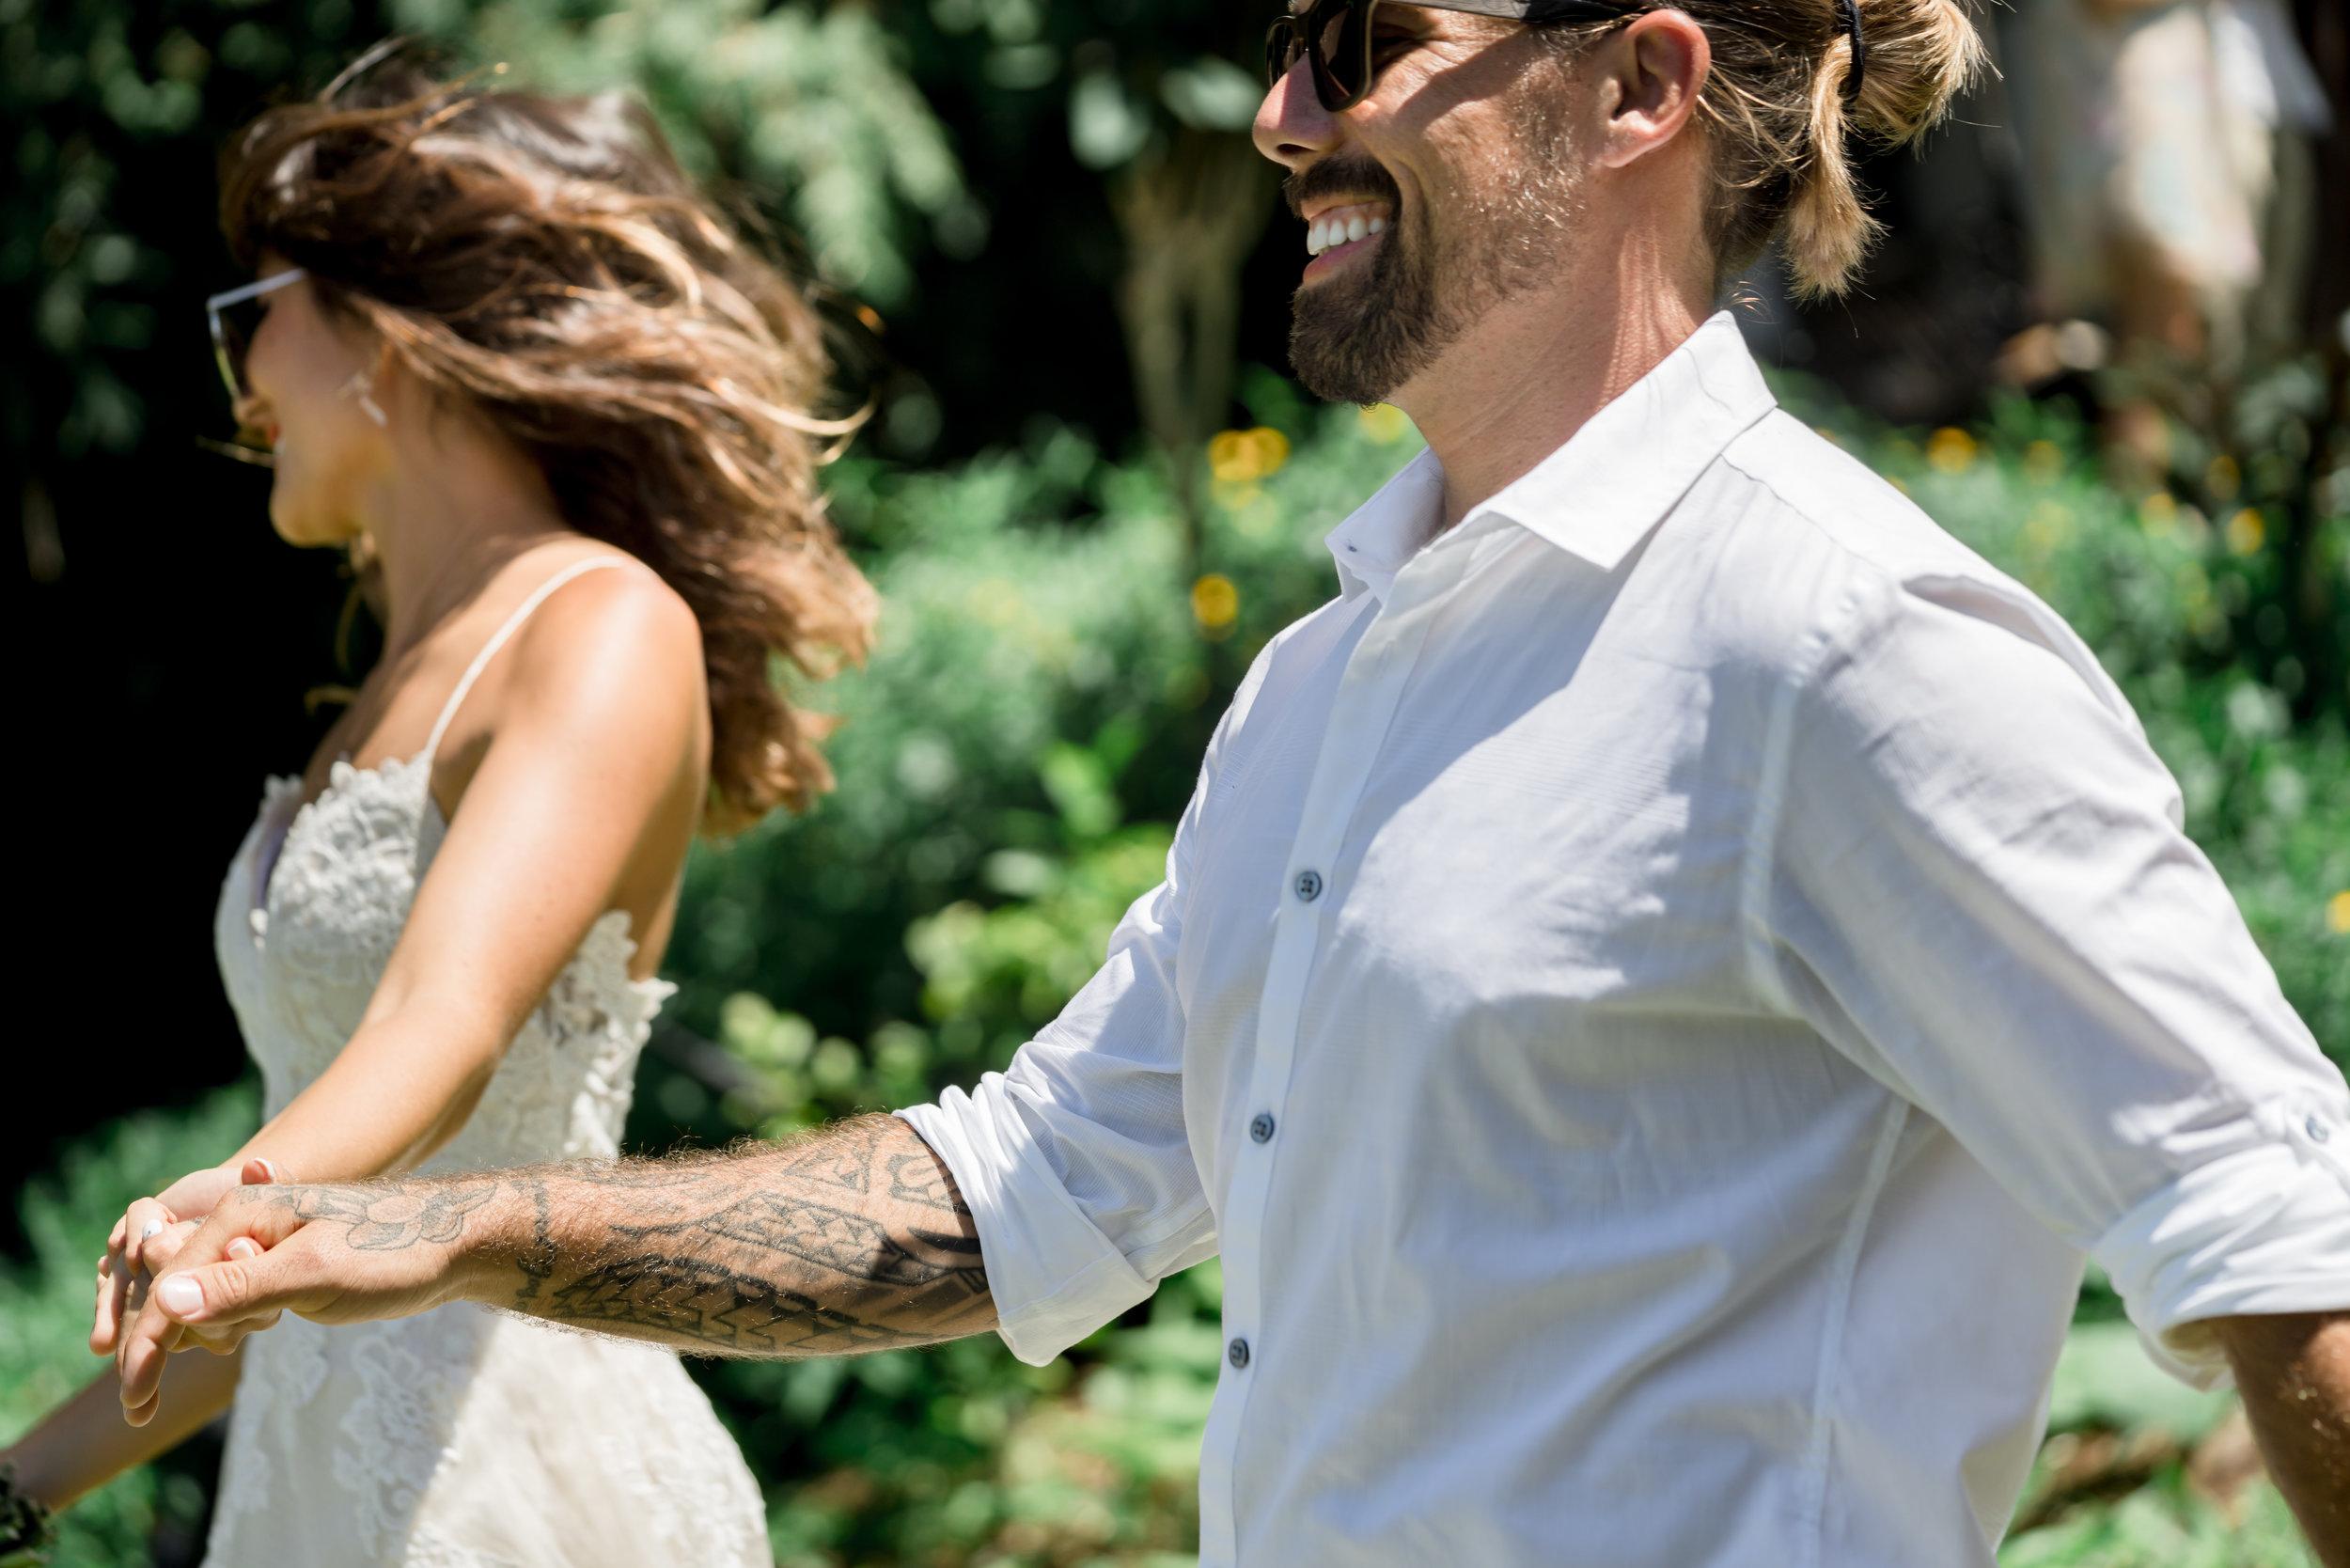 Waipio-Lookout-Garden-Party-Wedding-Photographer-EMotion-Galleri